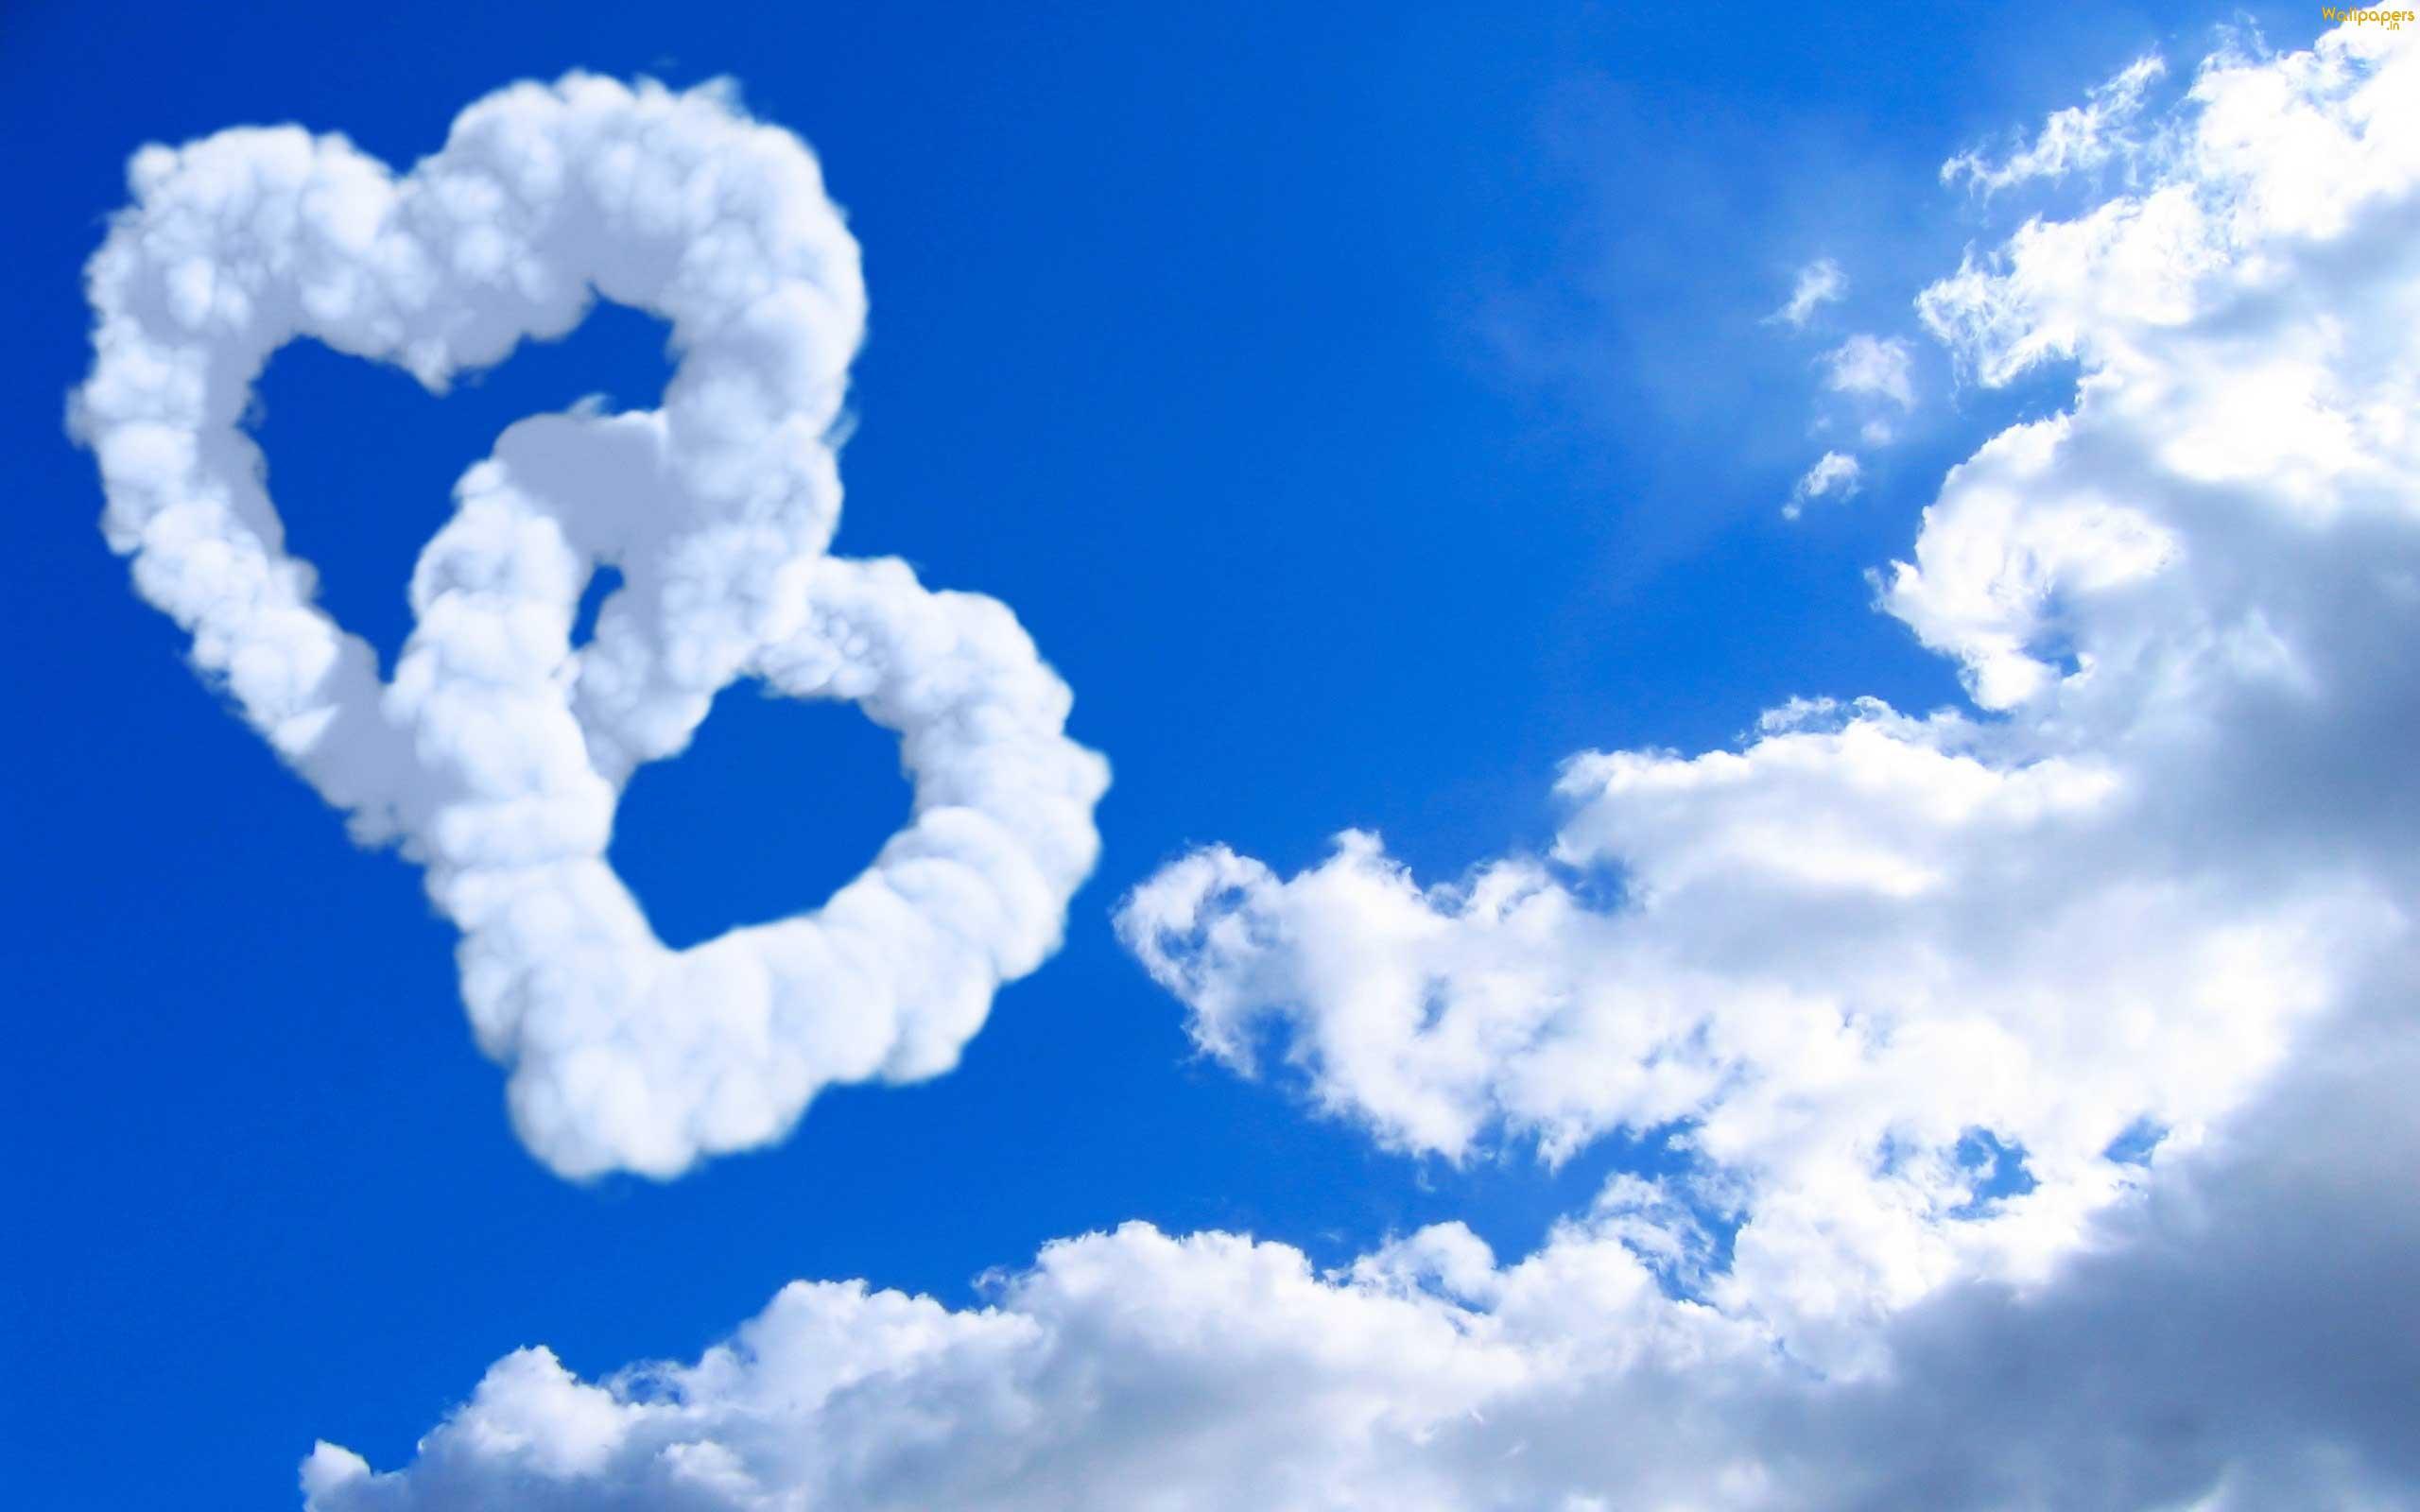 cloud love hd desktop wallpaper wallpapers55com Best Wallpapers 2560x1600